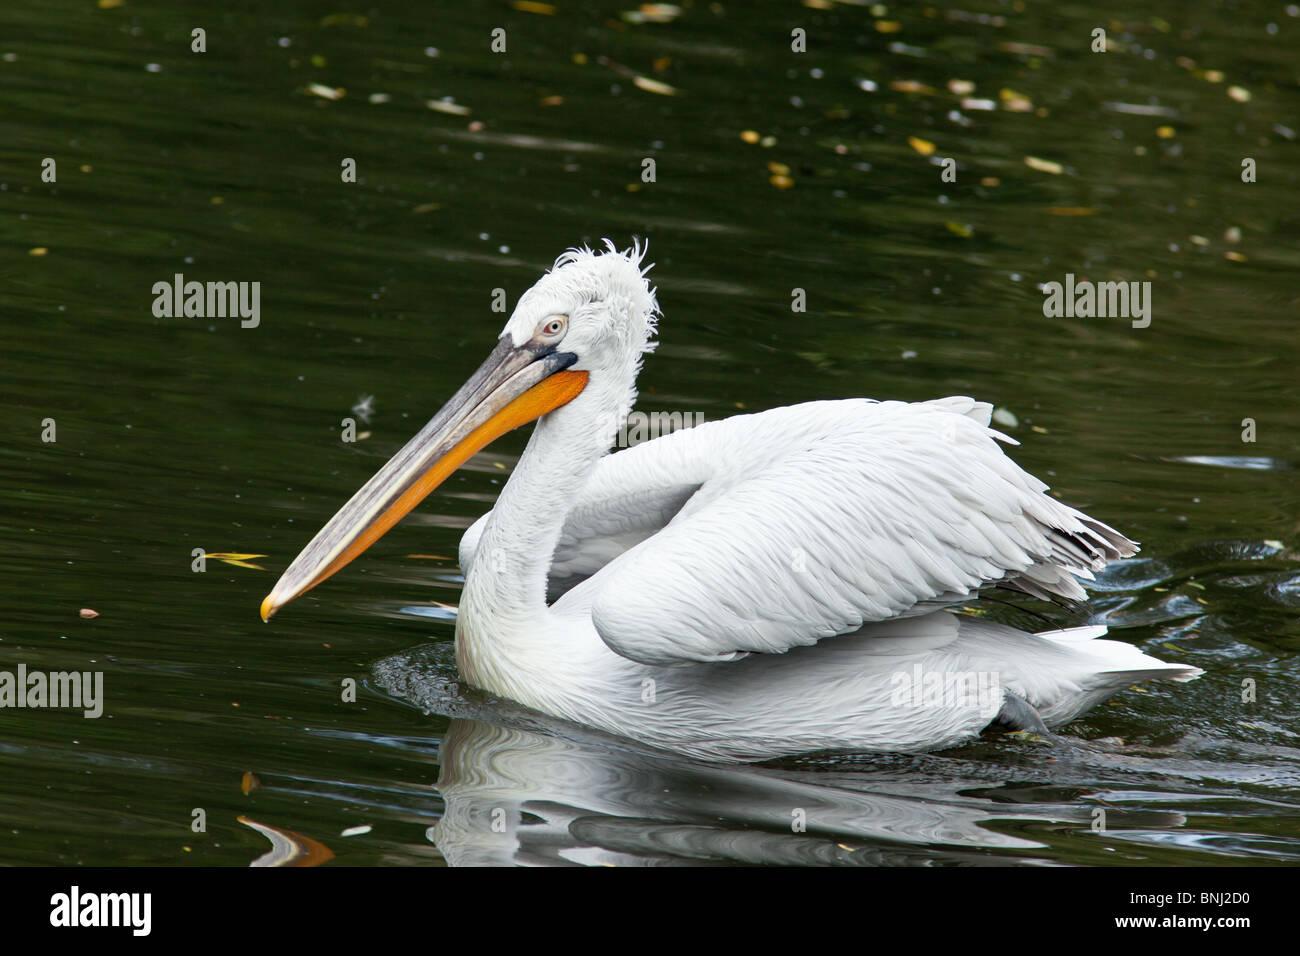 Dalmatian pelican, Pelecanus crispus. The bird is in a zoo. - Stock Image